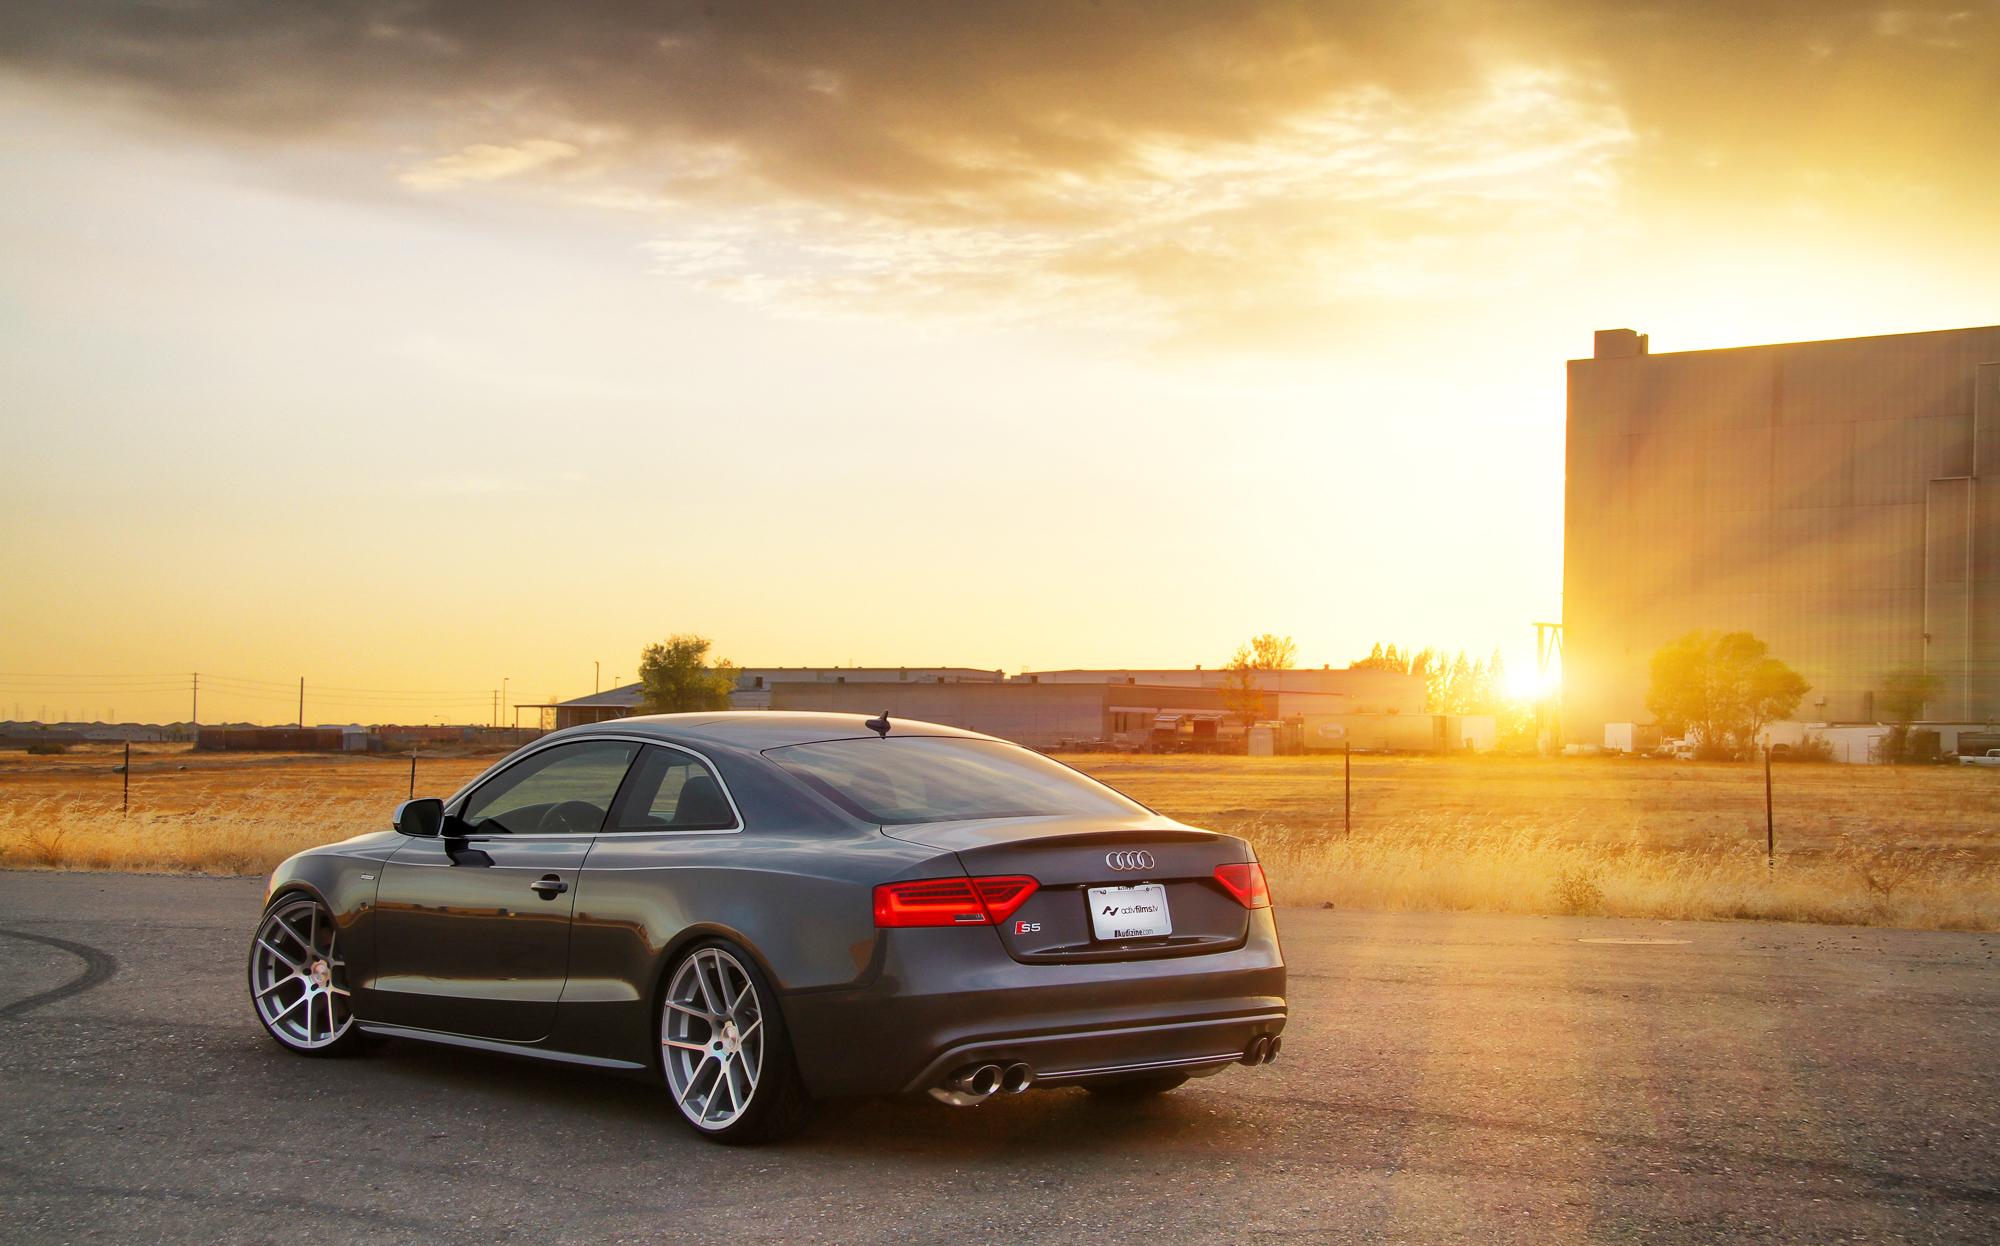 Audi s5 full hd fond d 39 cran and arri re plan 2000x1246 id 490962 - Car wallpapers for galaxy s5 ...